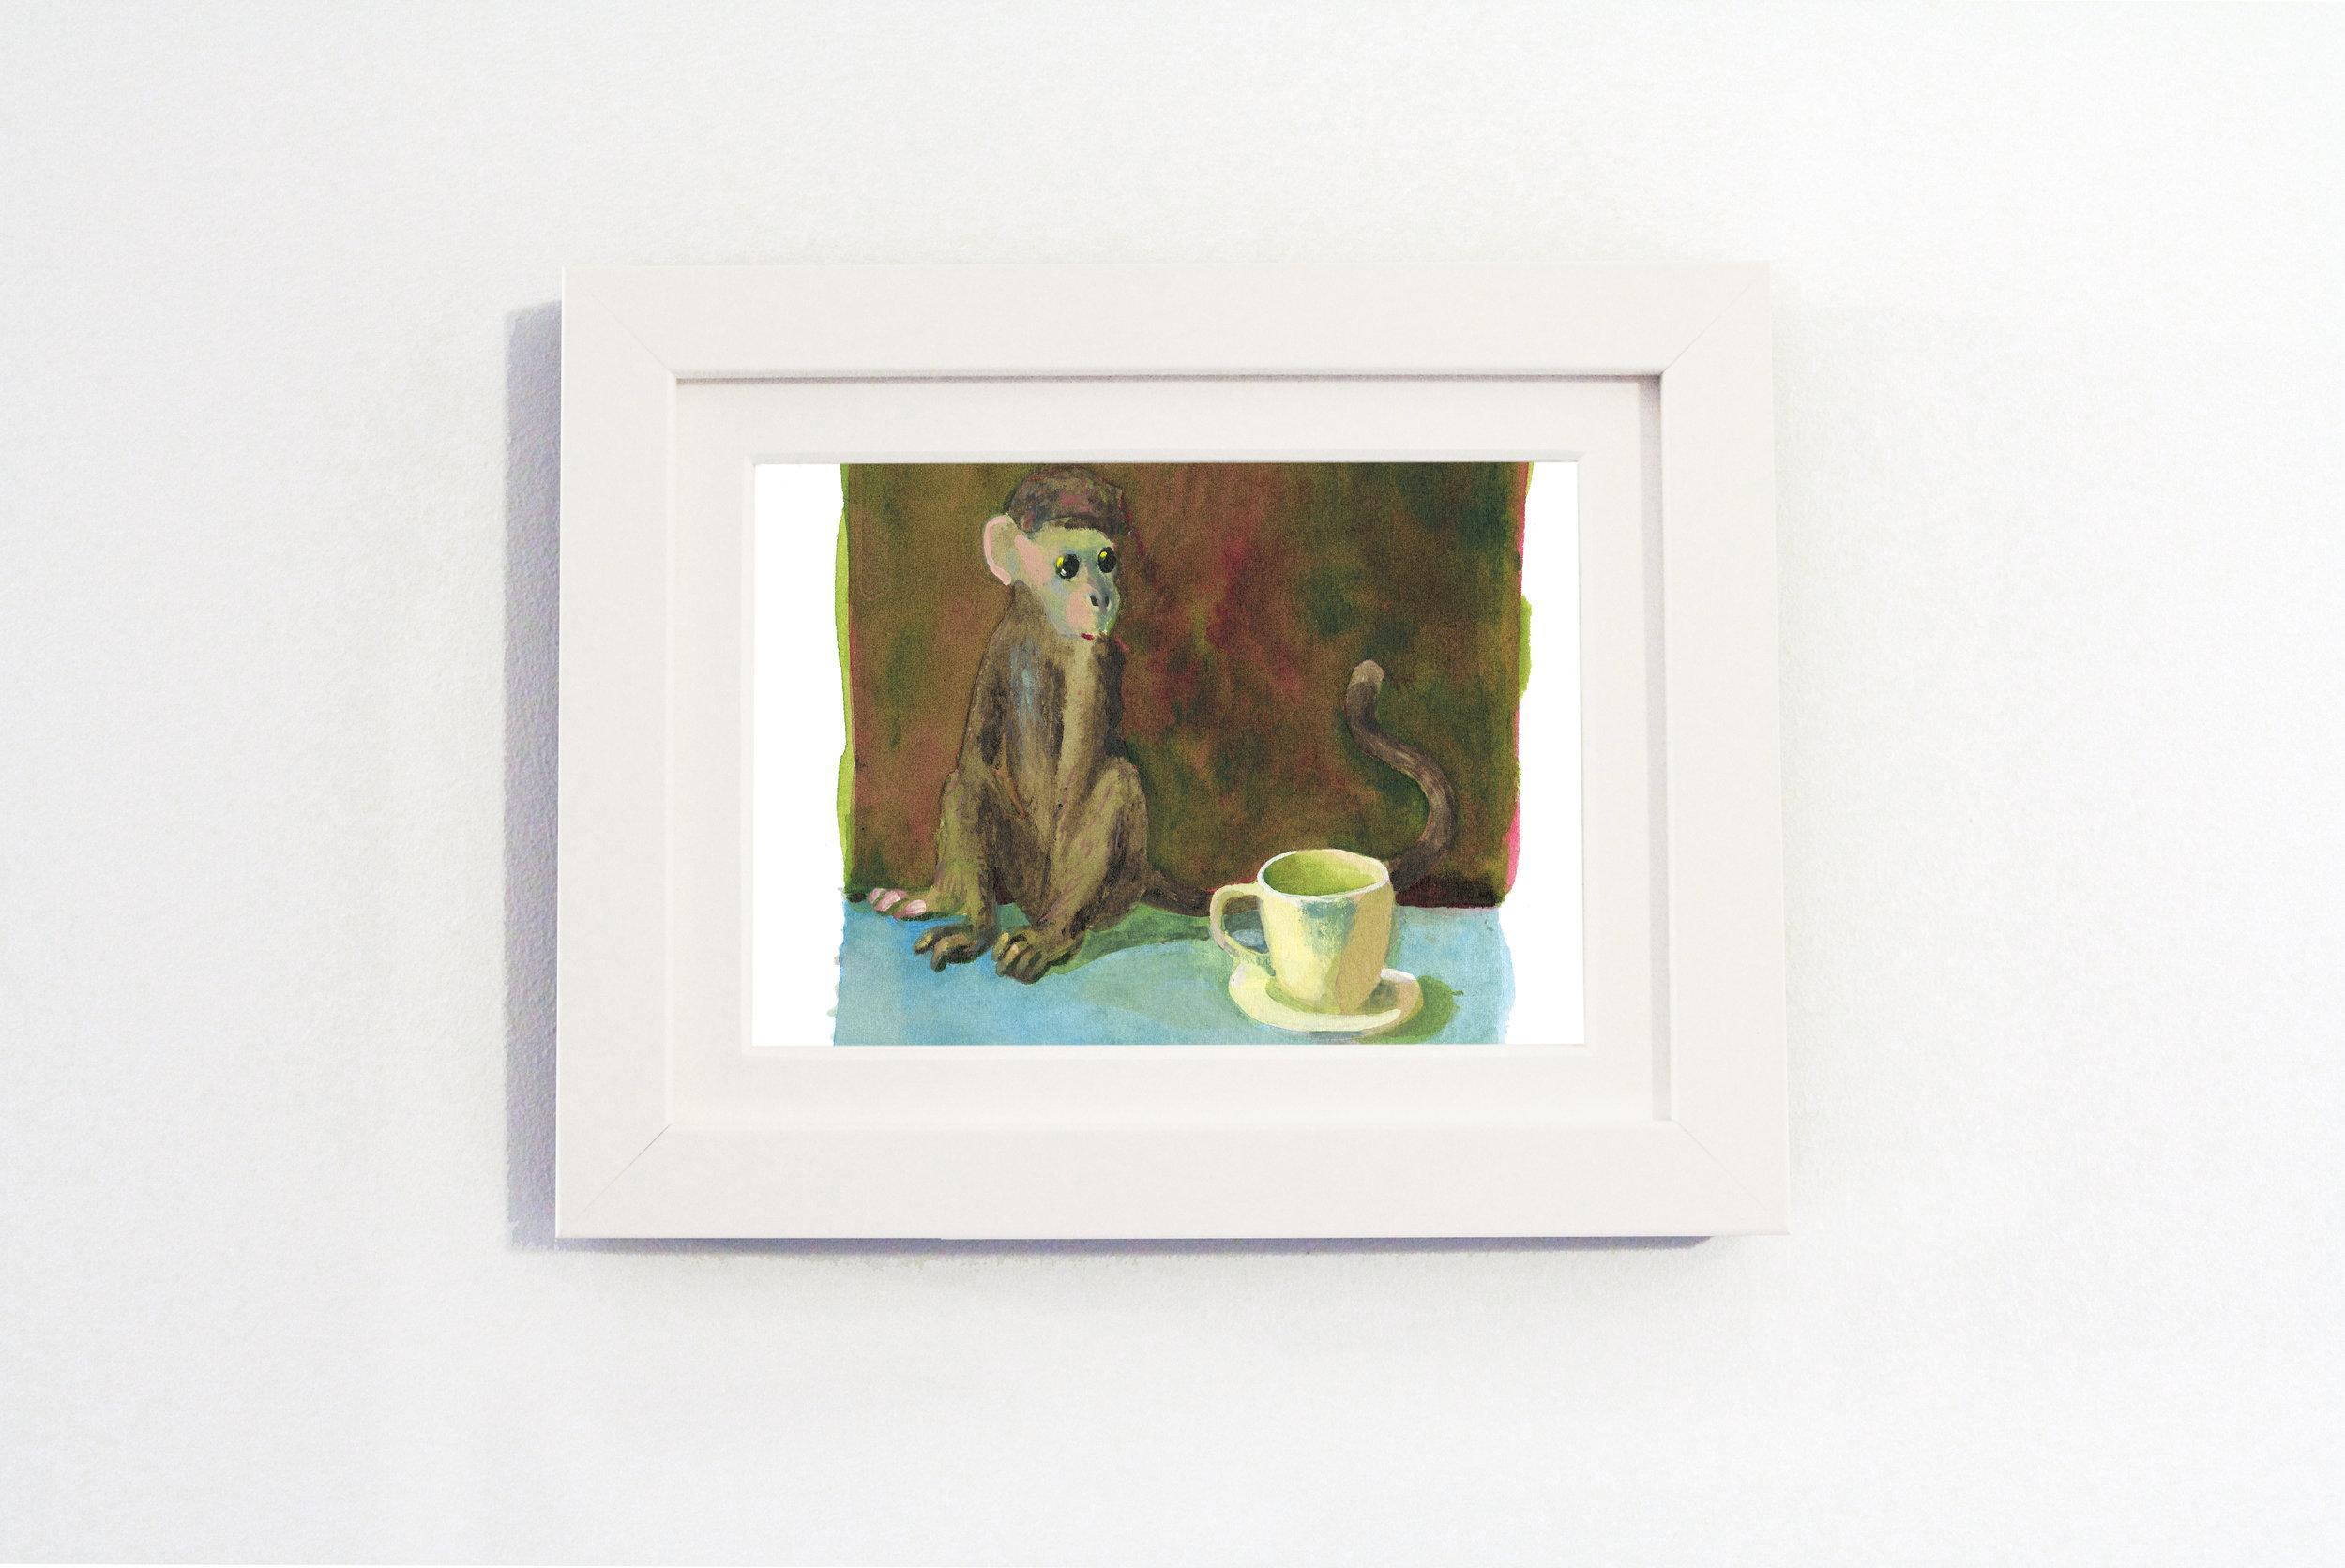 Monkey and teacup white.jpg